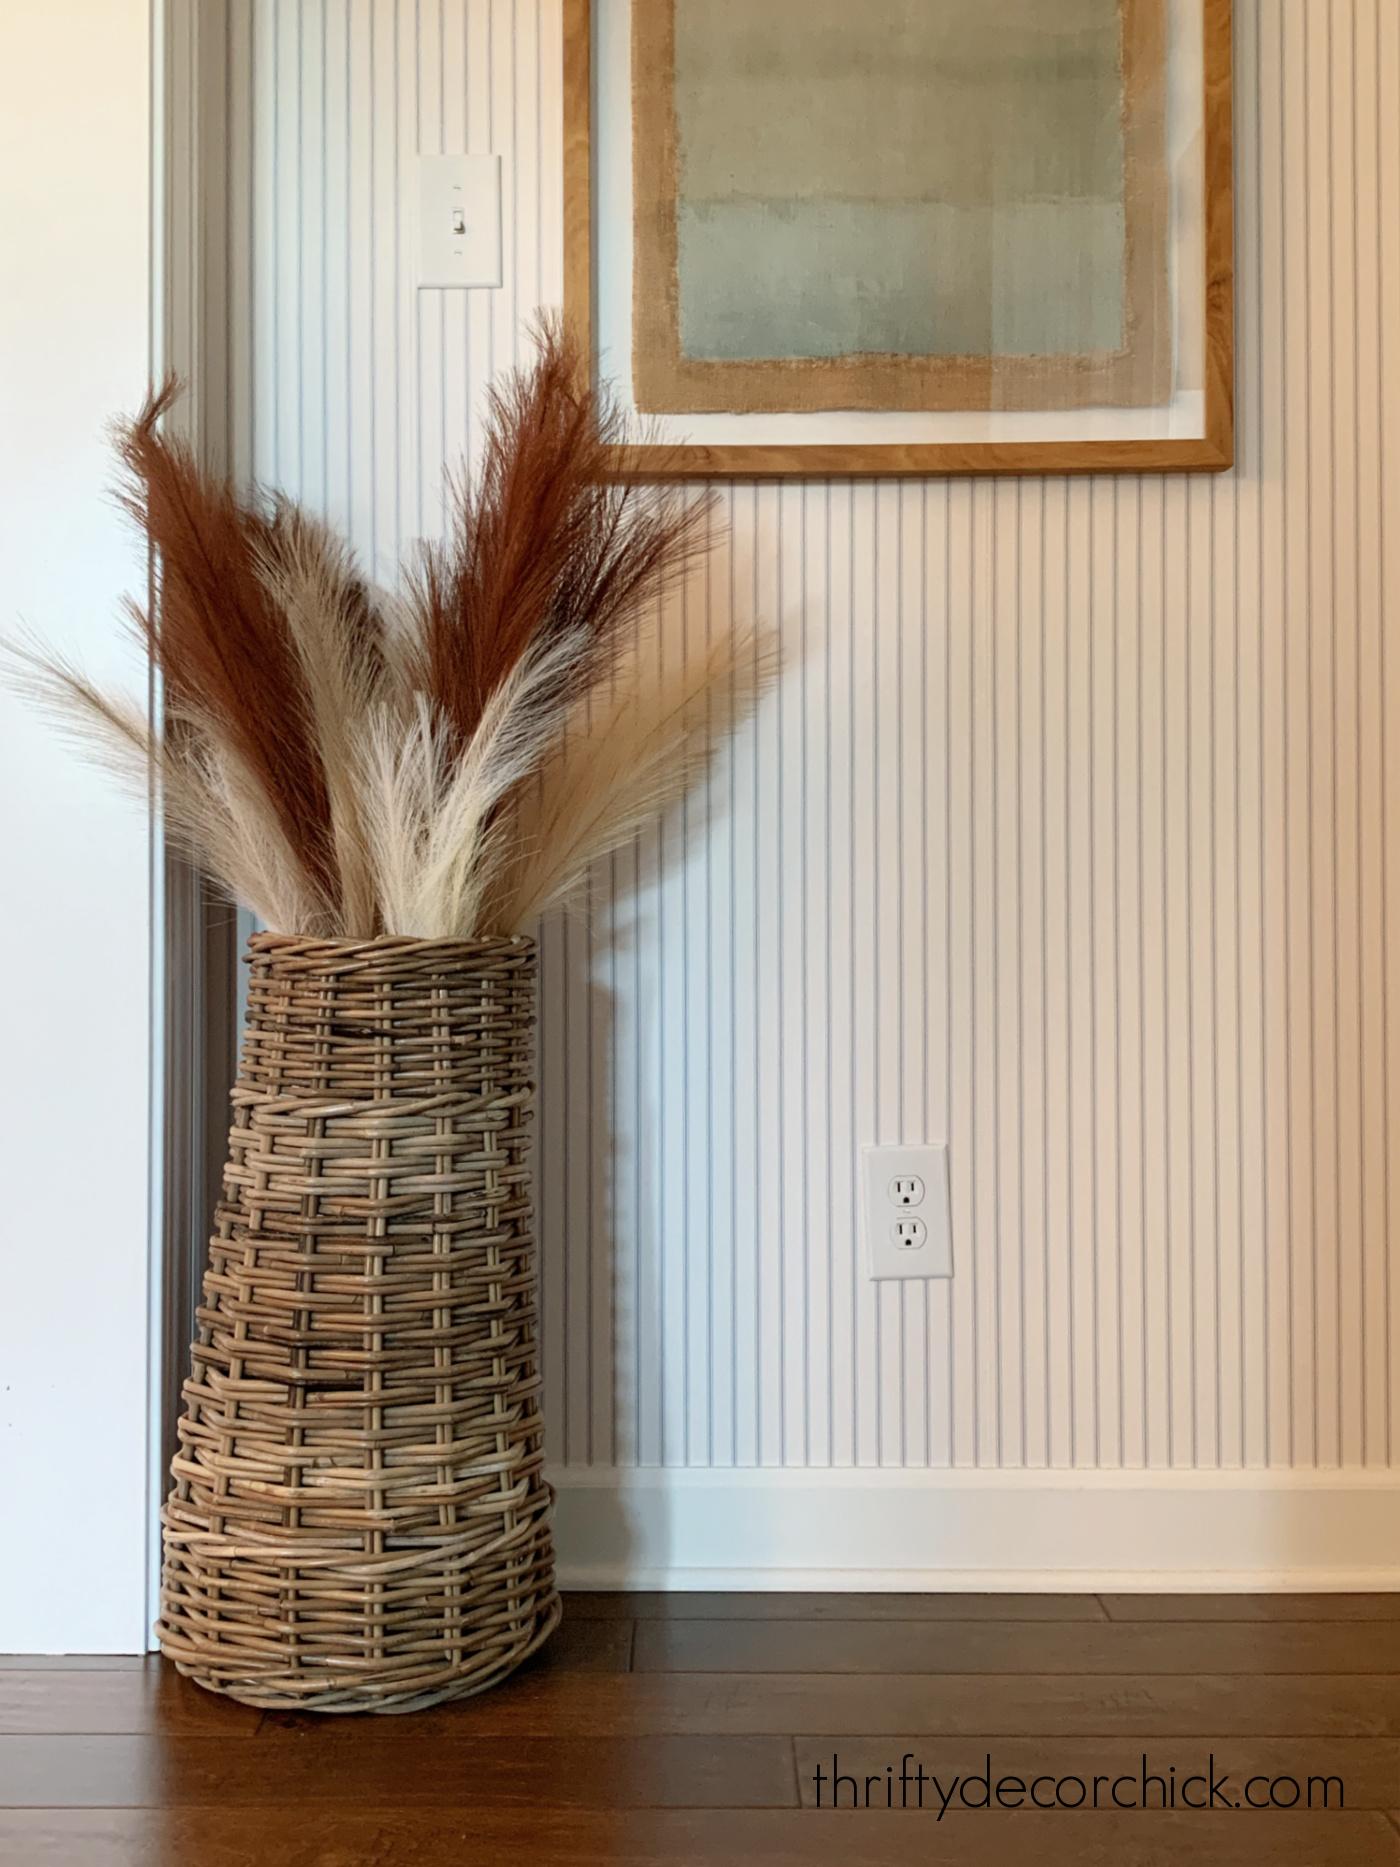 Pampas grass in tall basket